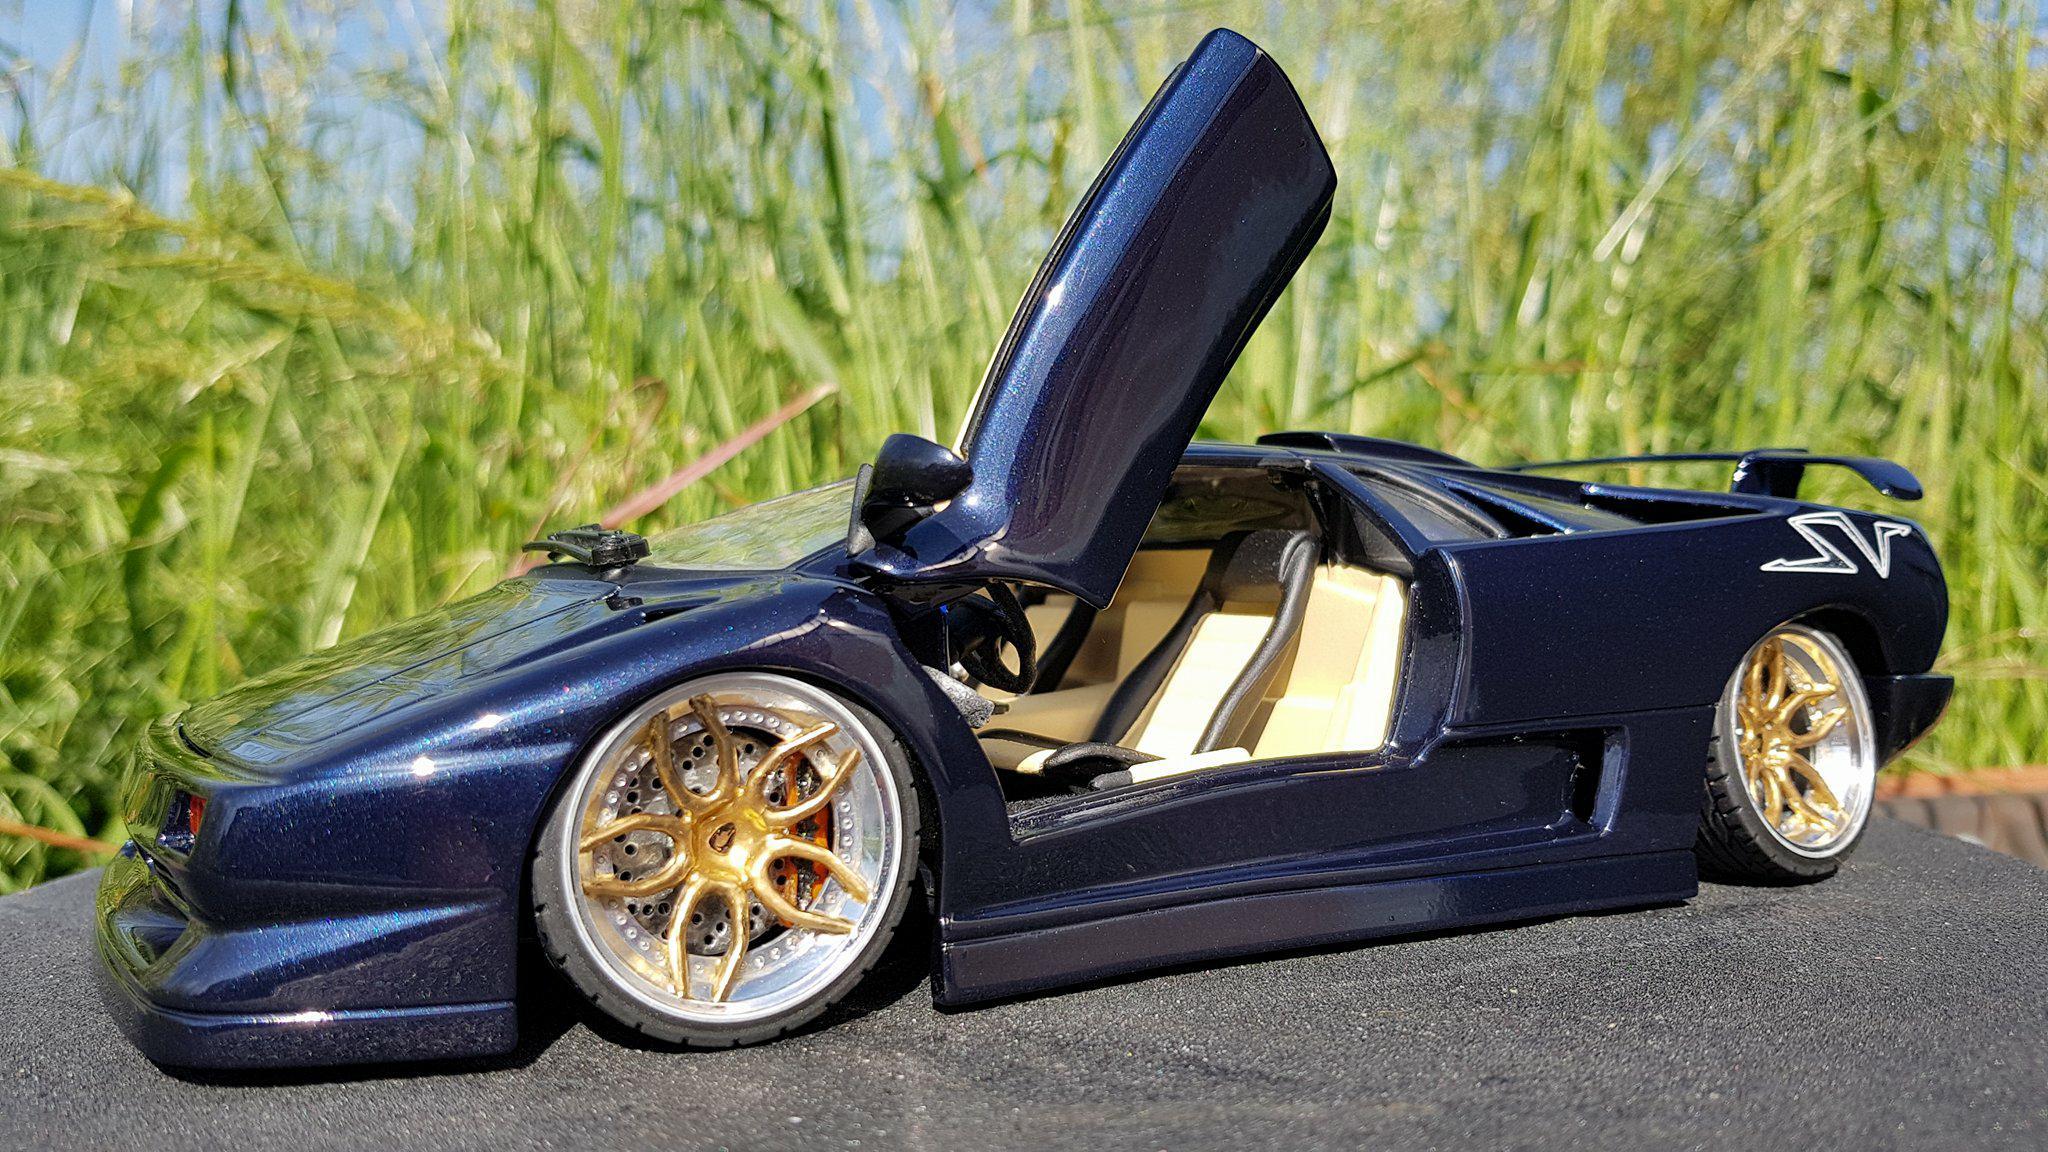 Voiture de collection Lamborghini Diablo SV blu fontus  jantes 20 pouces tuning Maisto. Lamborghini Diablo SV blu fontus  jantes 20 pouces miniature 1/18